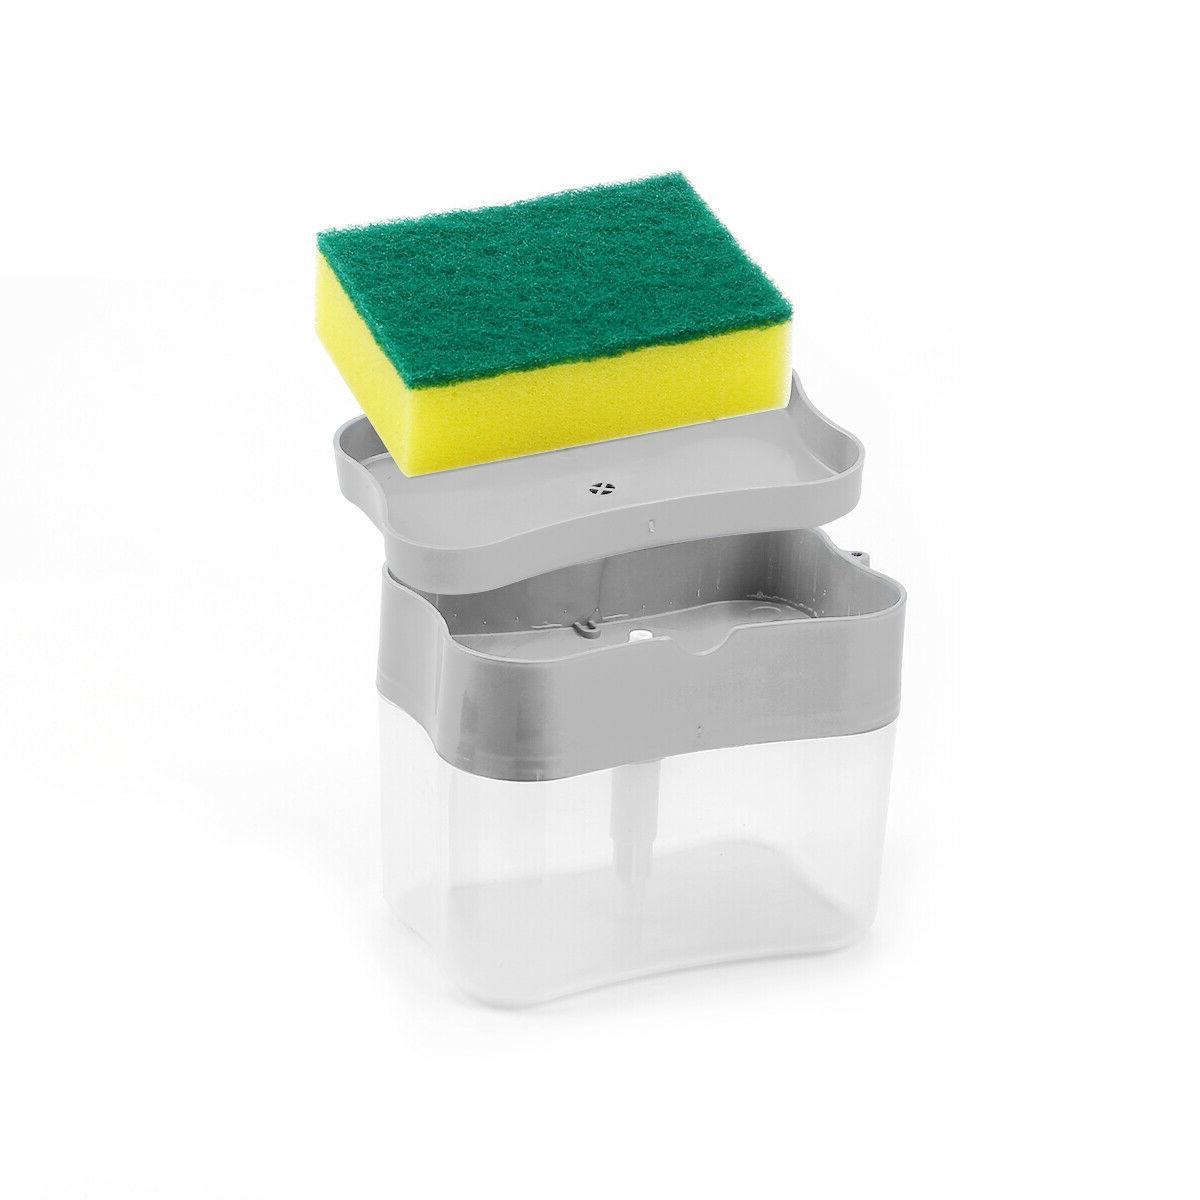 2 in1 Soap Pump Sponge Holder Press Rack